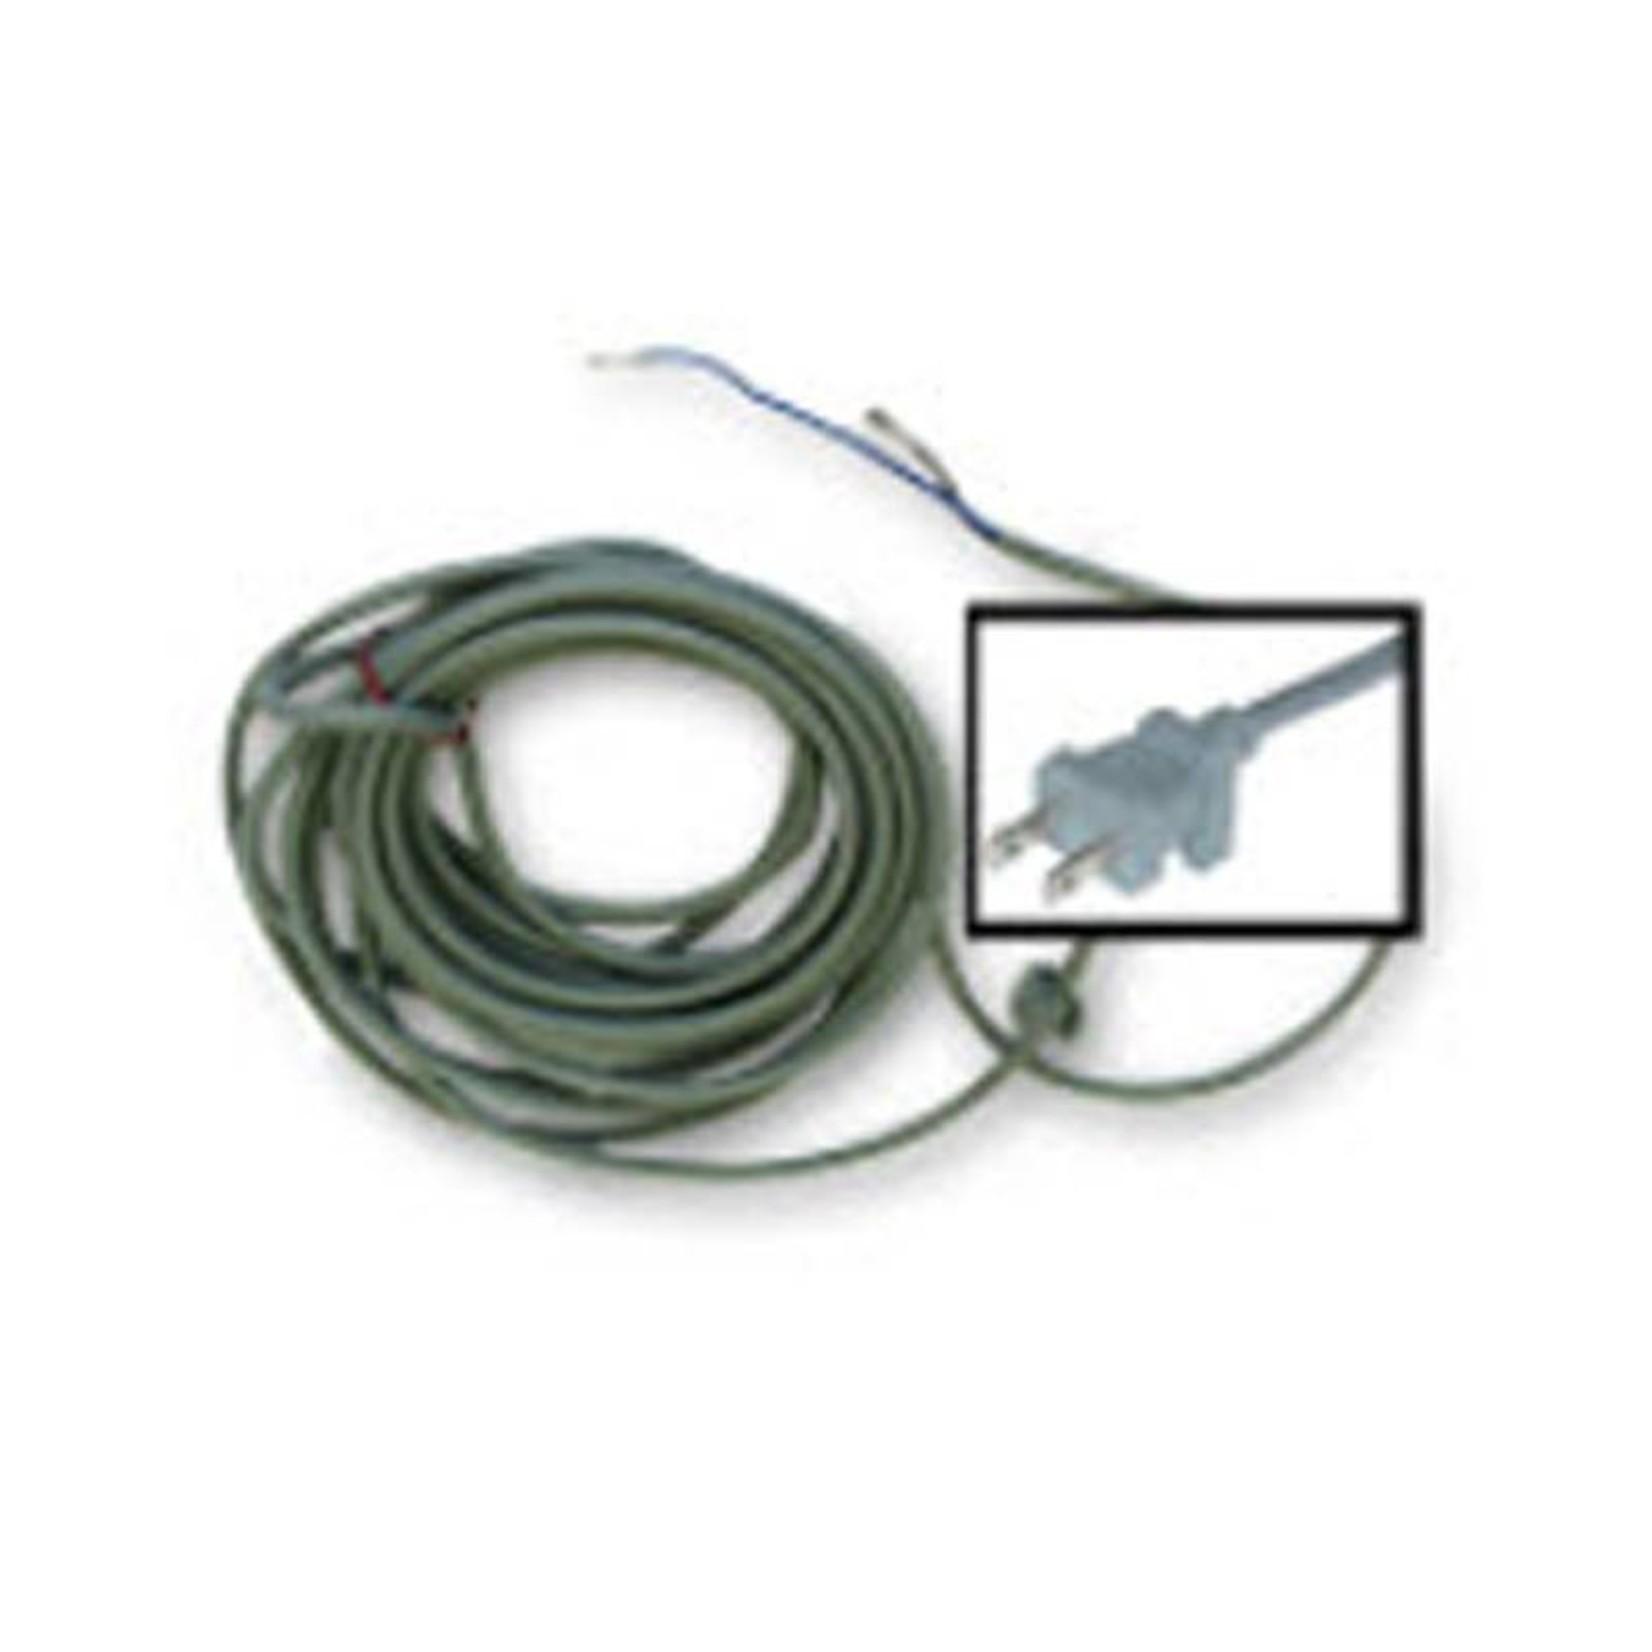 Dyson Dyson DC25 Power Cord - Fits DC07/14/17/18